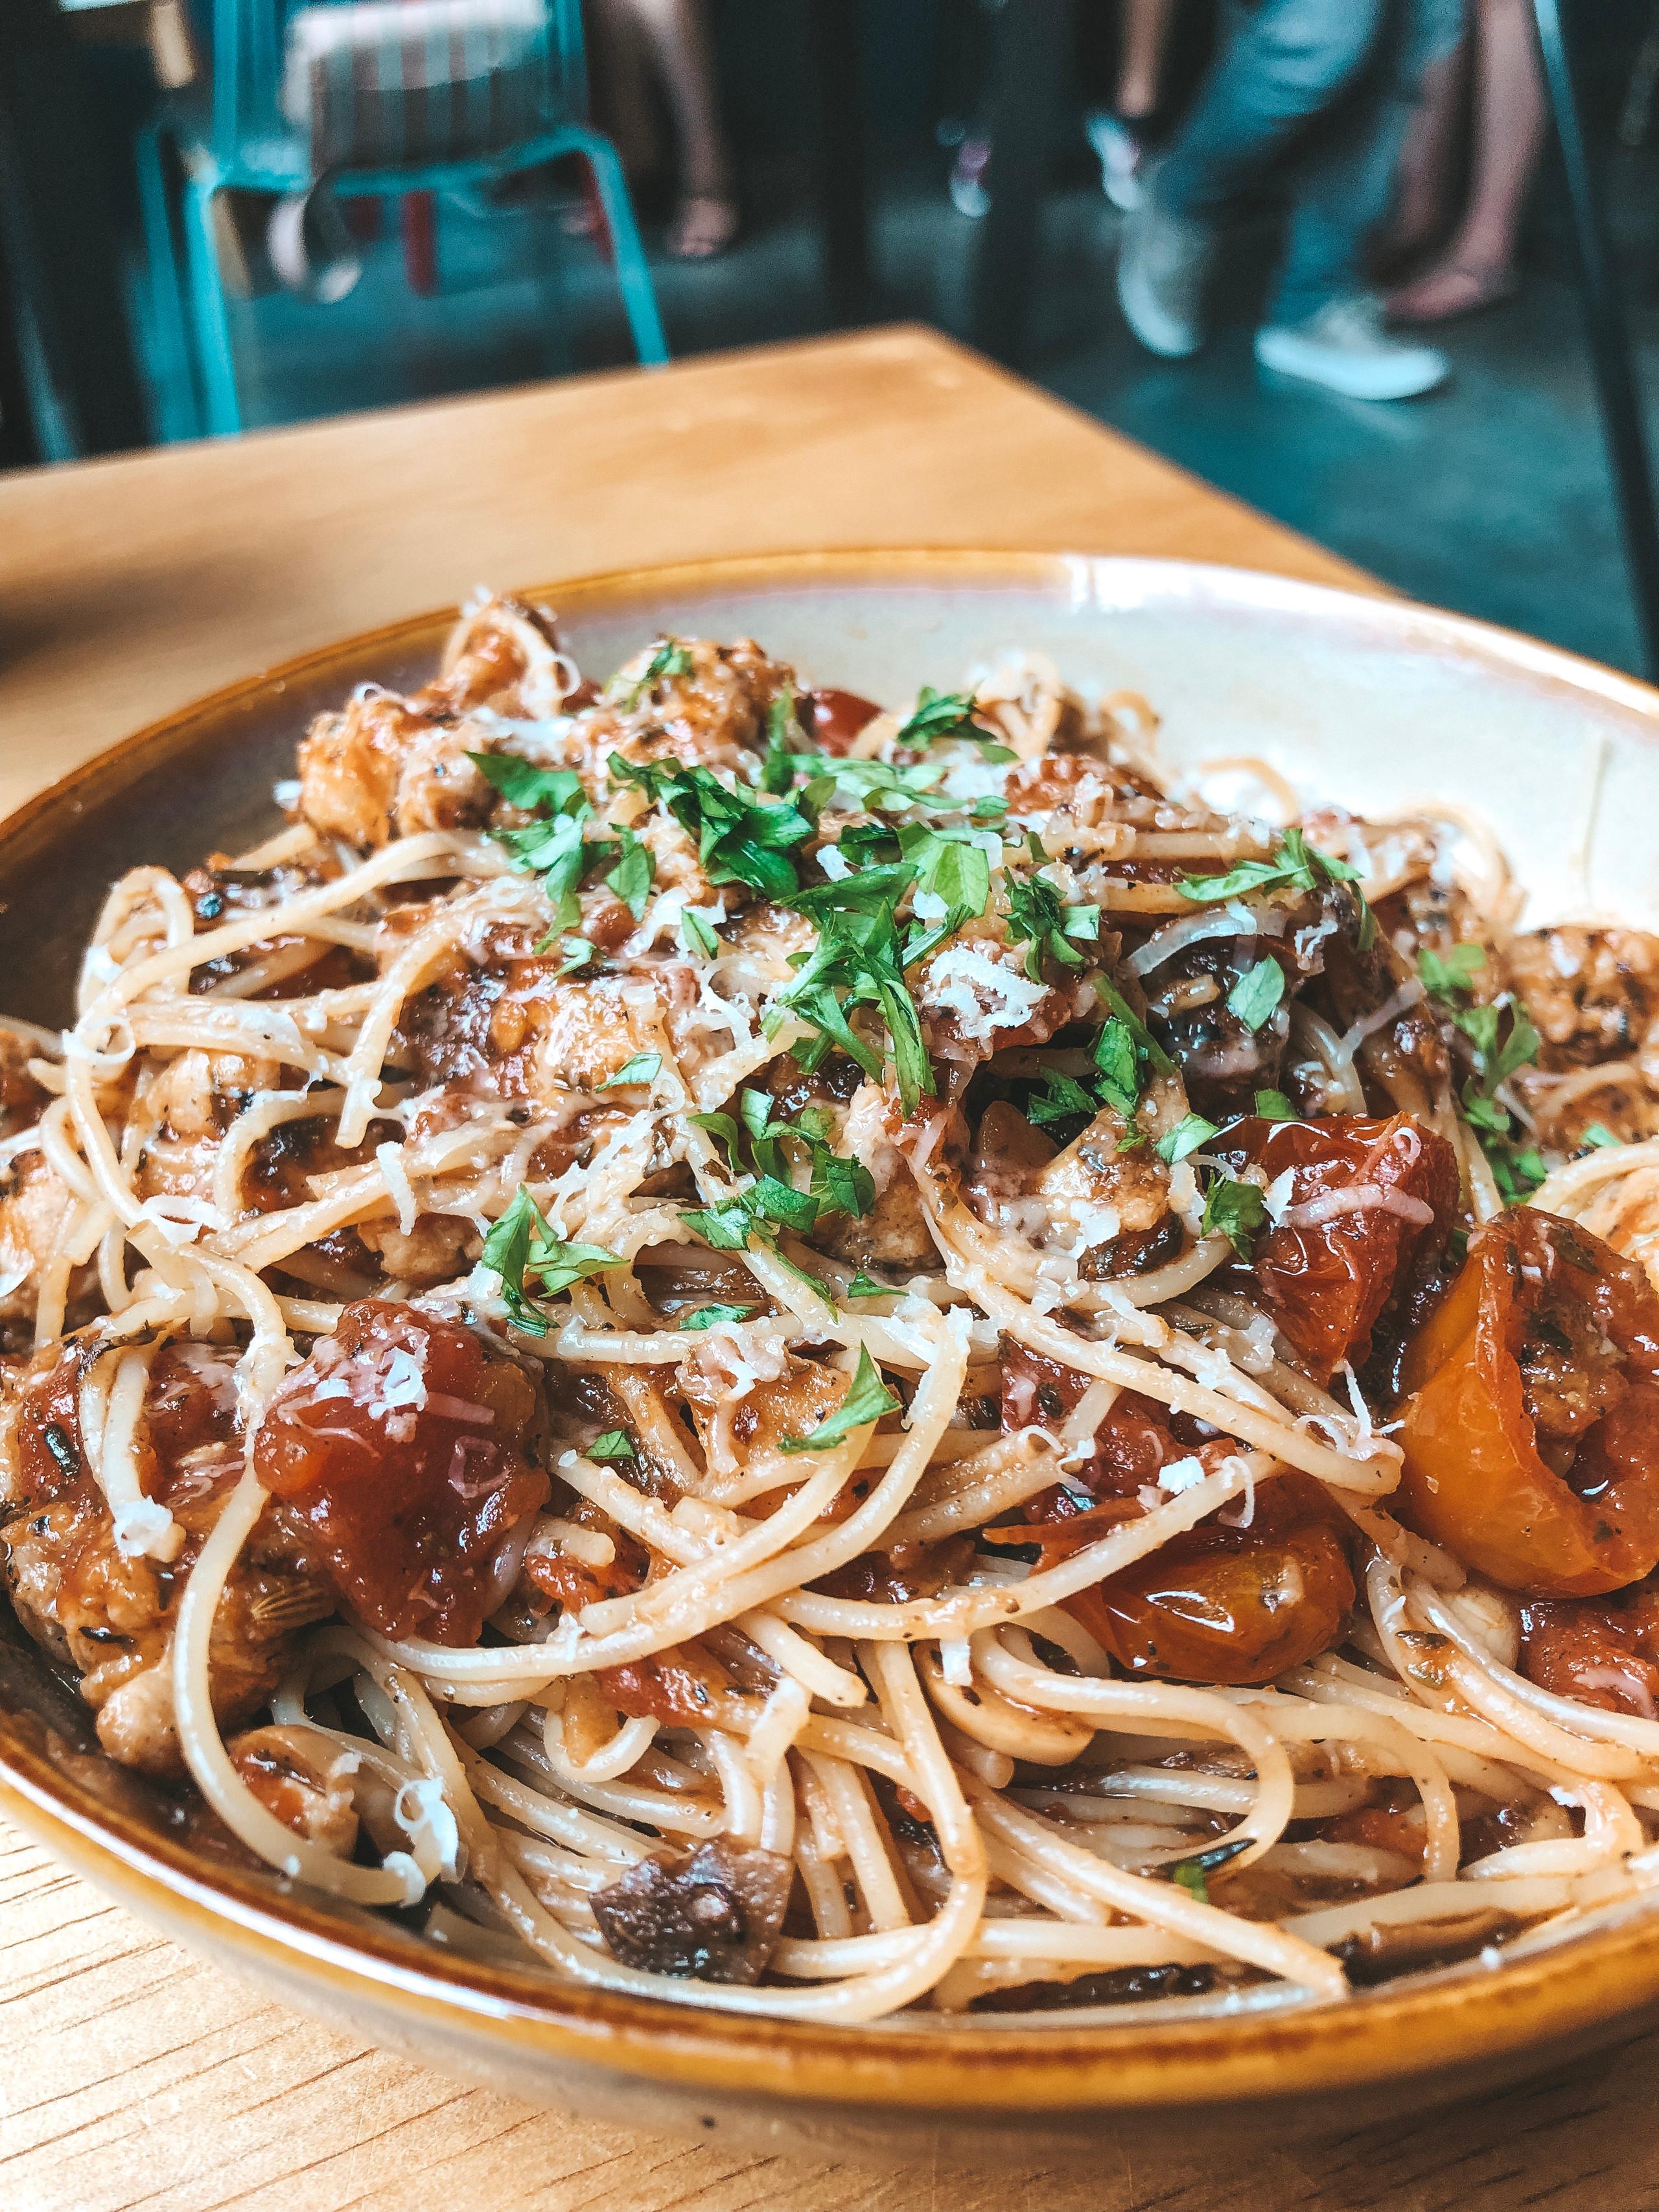 King and Prawn boardgame cafe singapore pasta